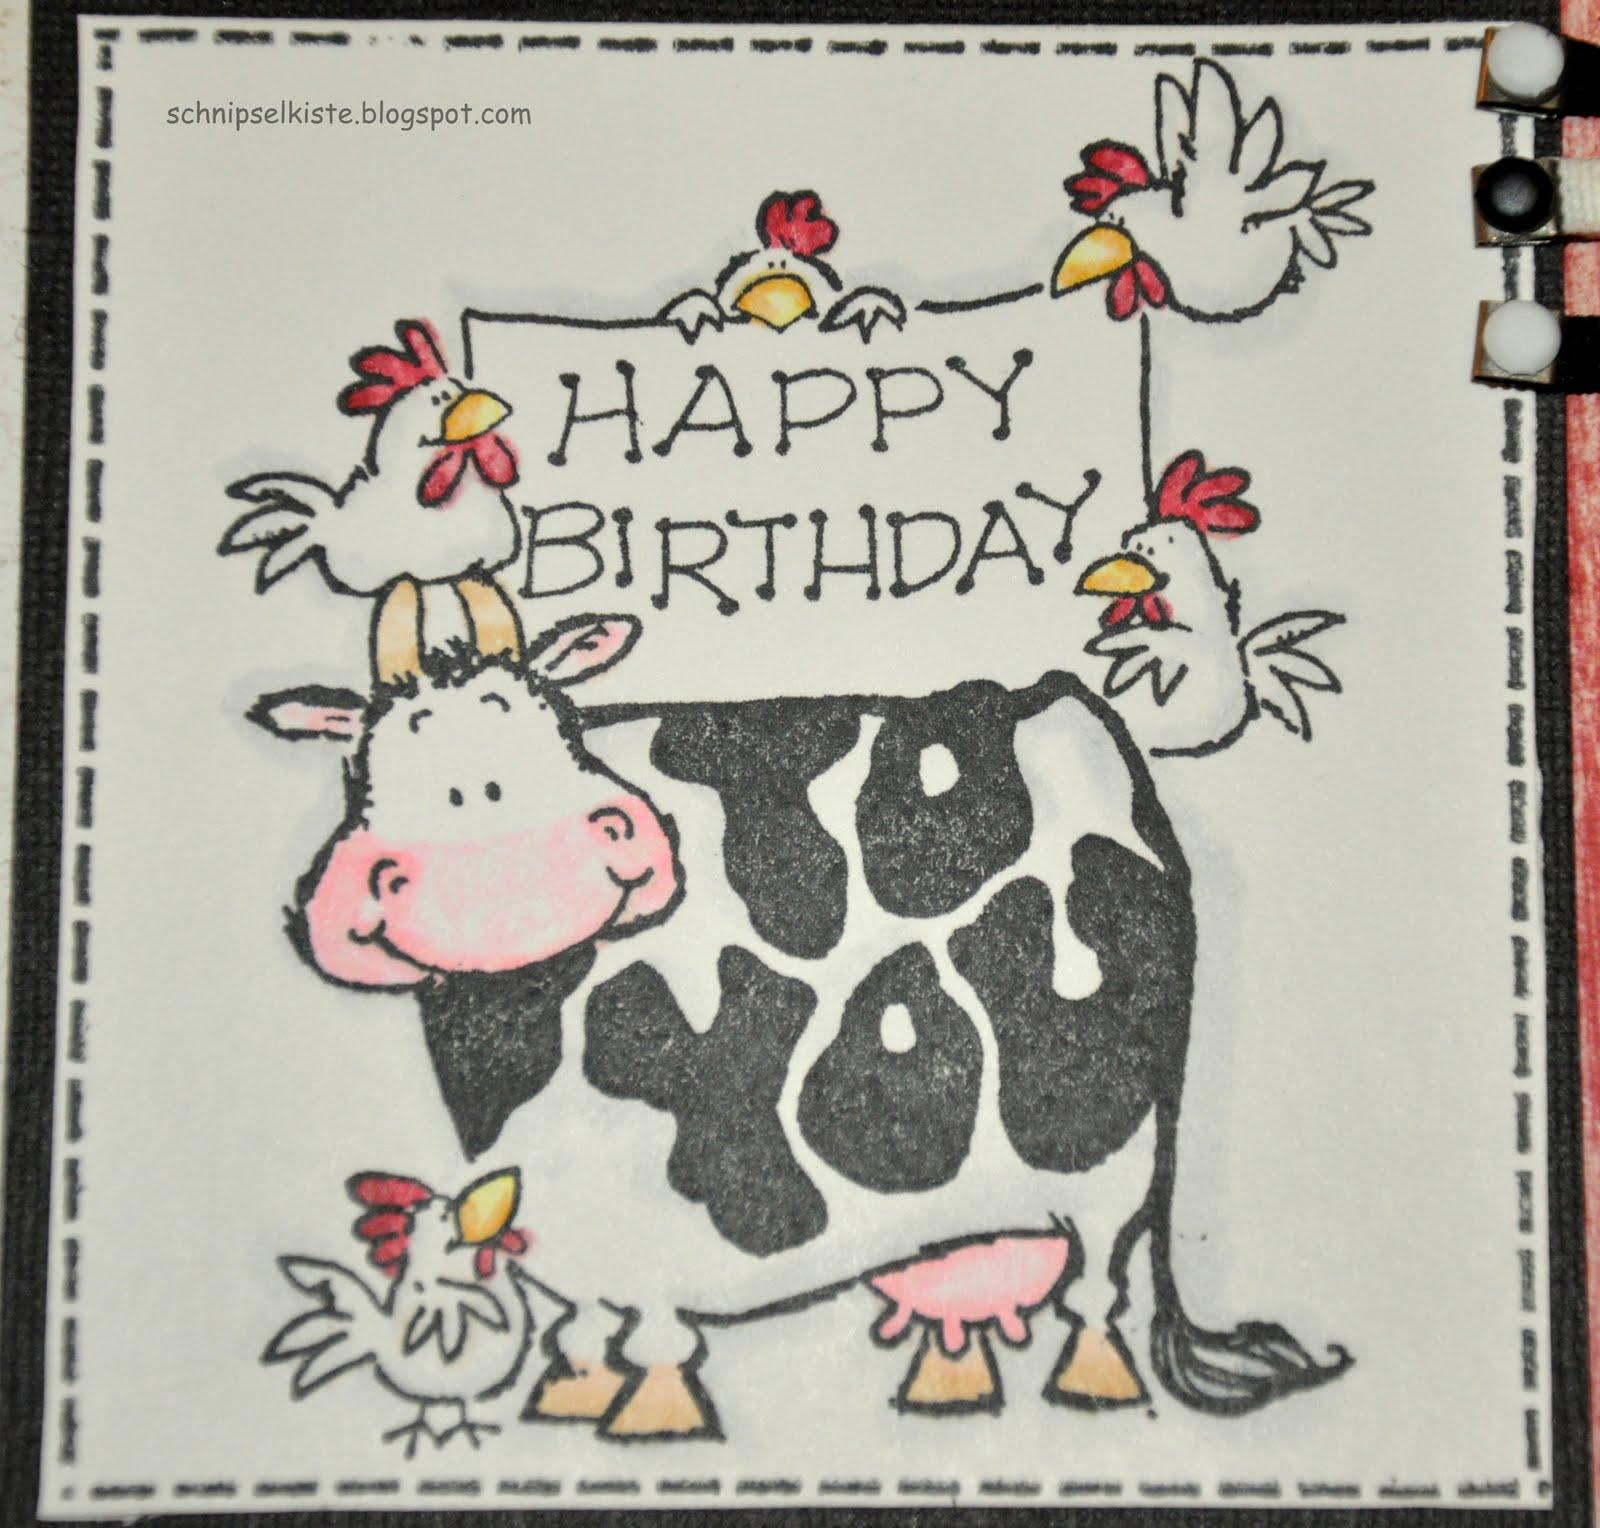 Kuhle Geburtstagsgrusse